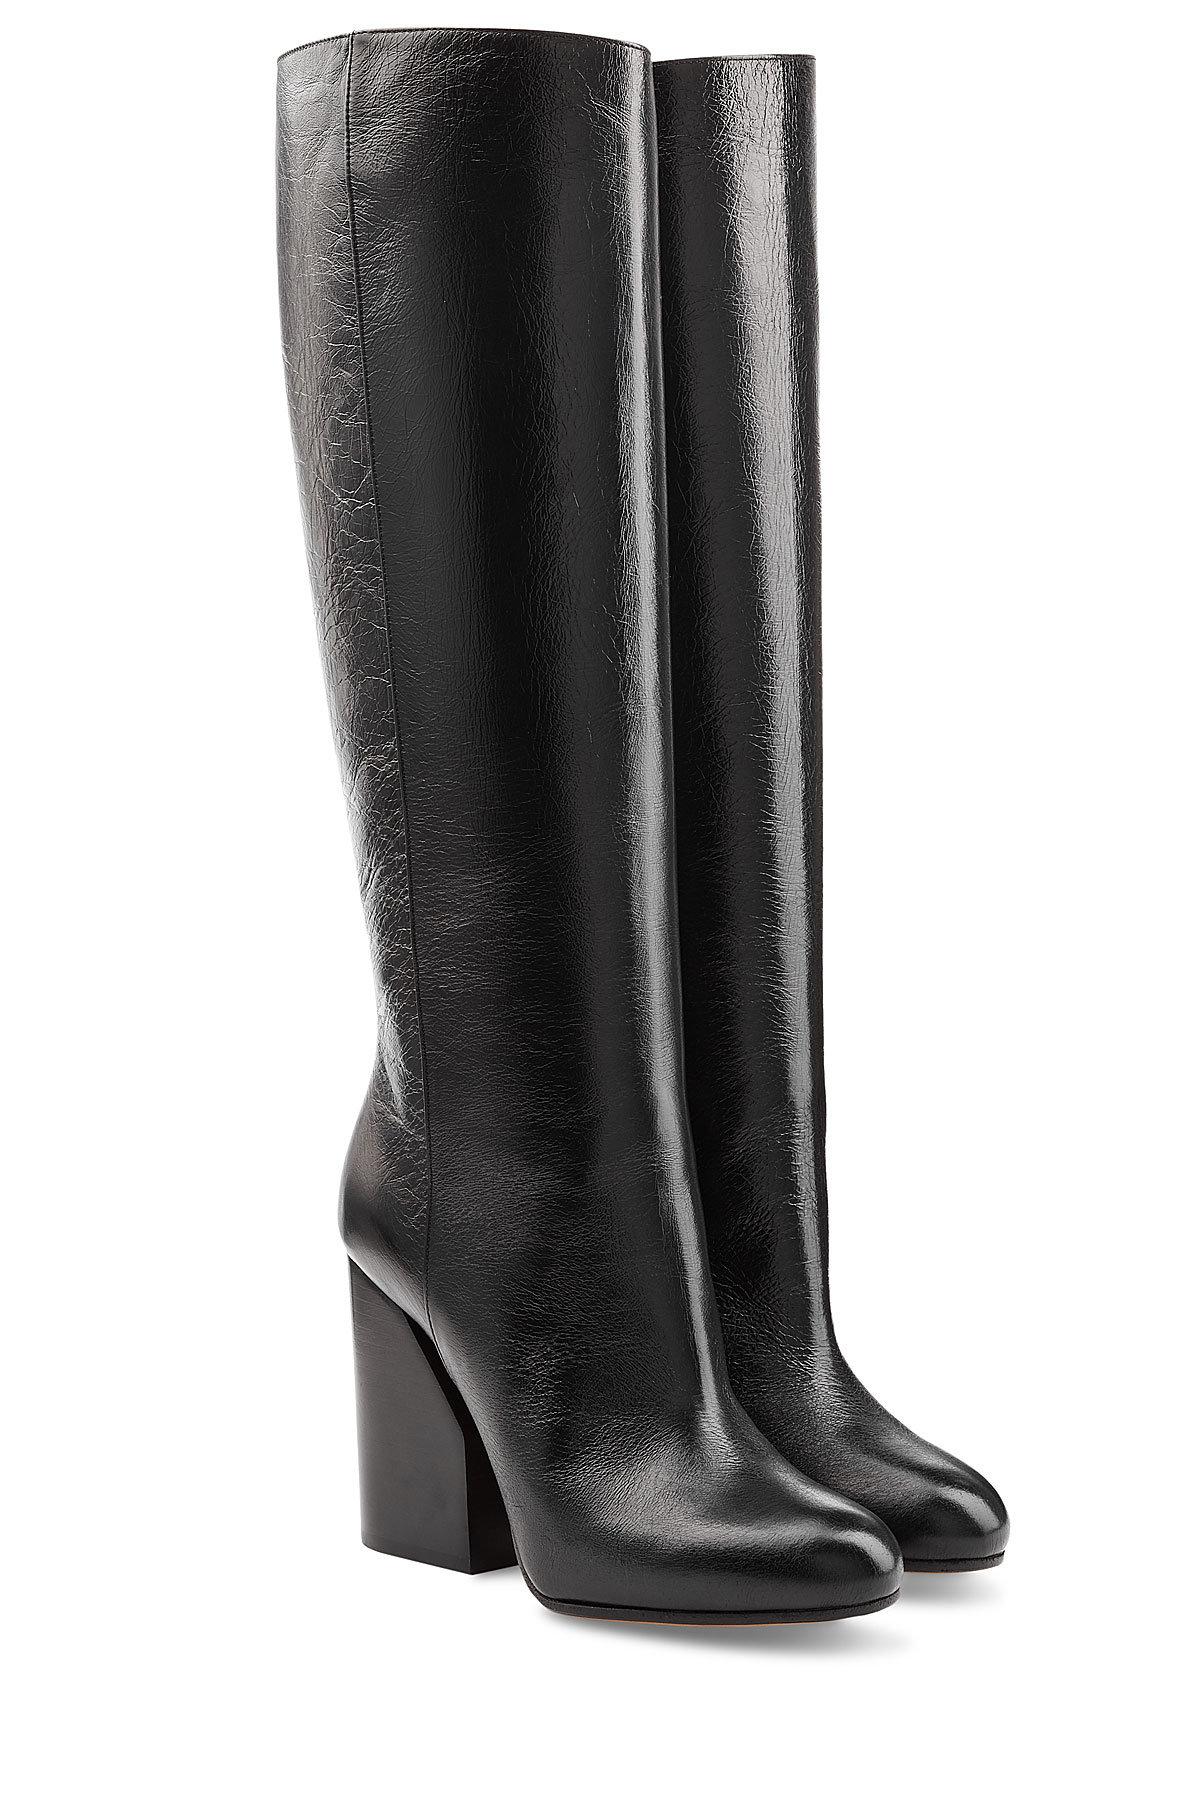 Maison Margiela Suede Knee Boots with Buttons Gr. EU 38.5 e9Siwu